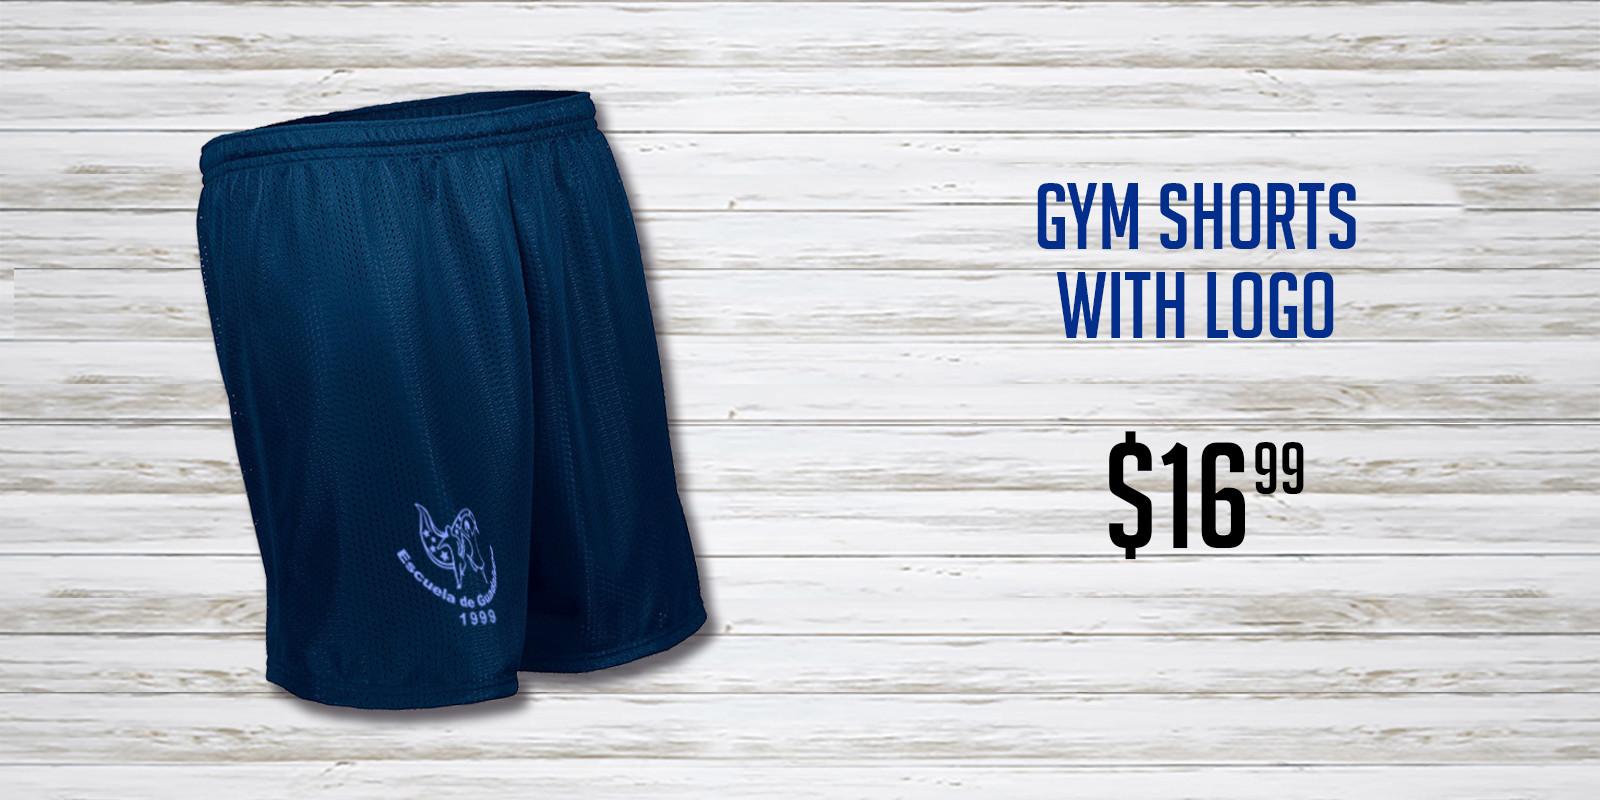 Escuela de Guadalupe Navy Gym Shorts NEW